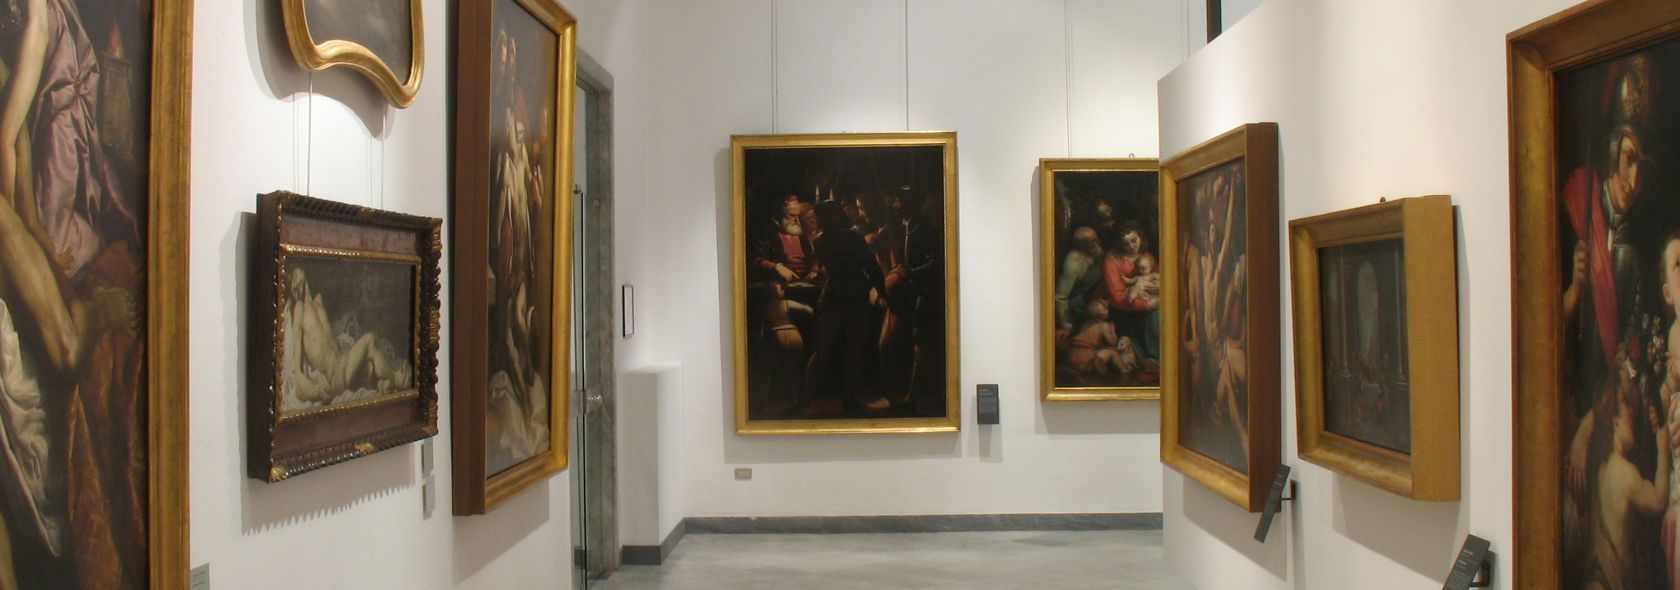 Accademia Ligustica - Il Seicento genovese -  foto © Francesco Manias